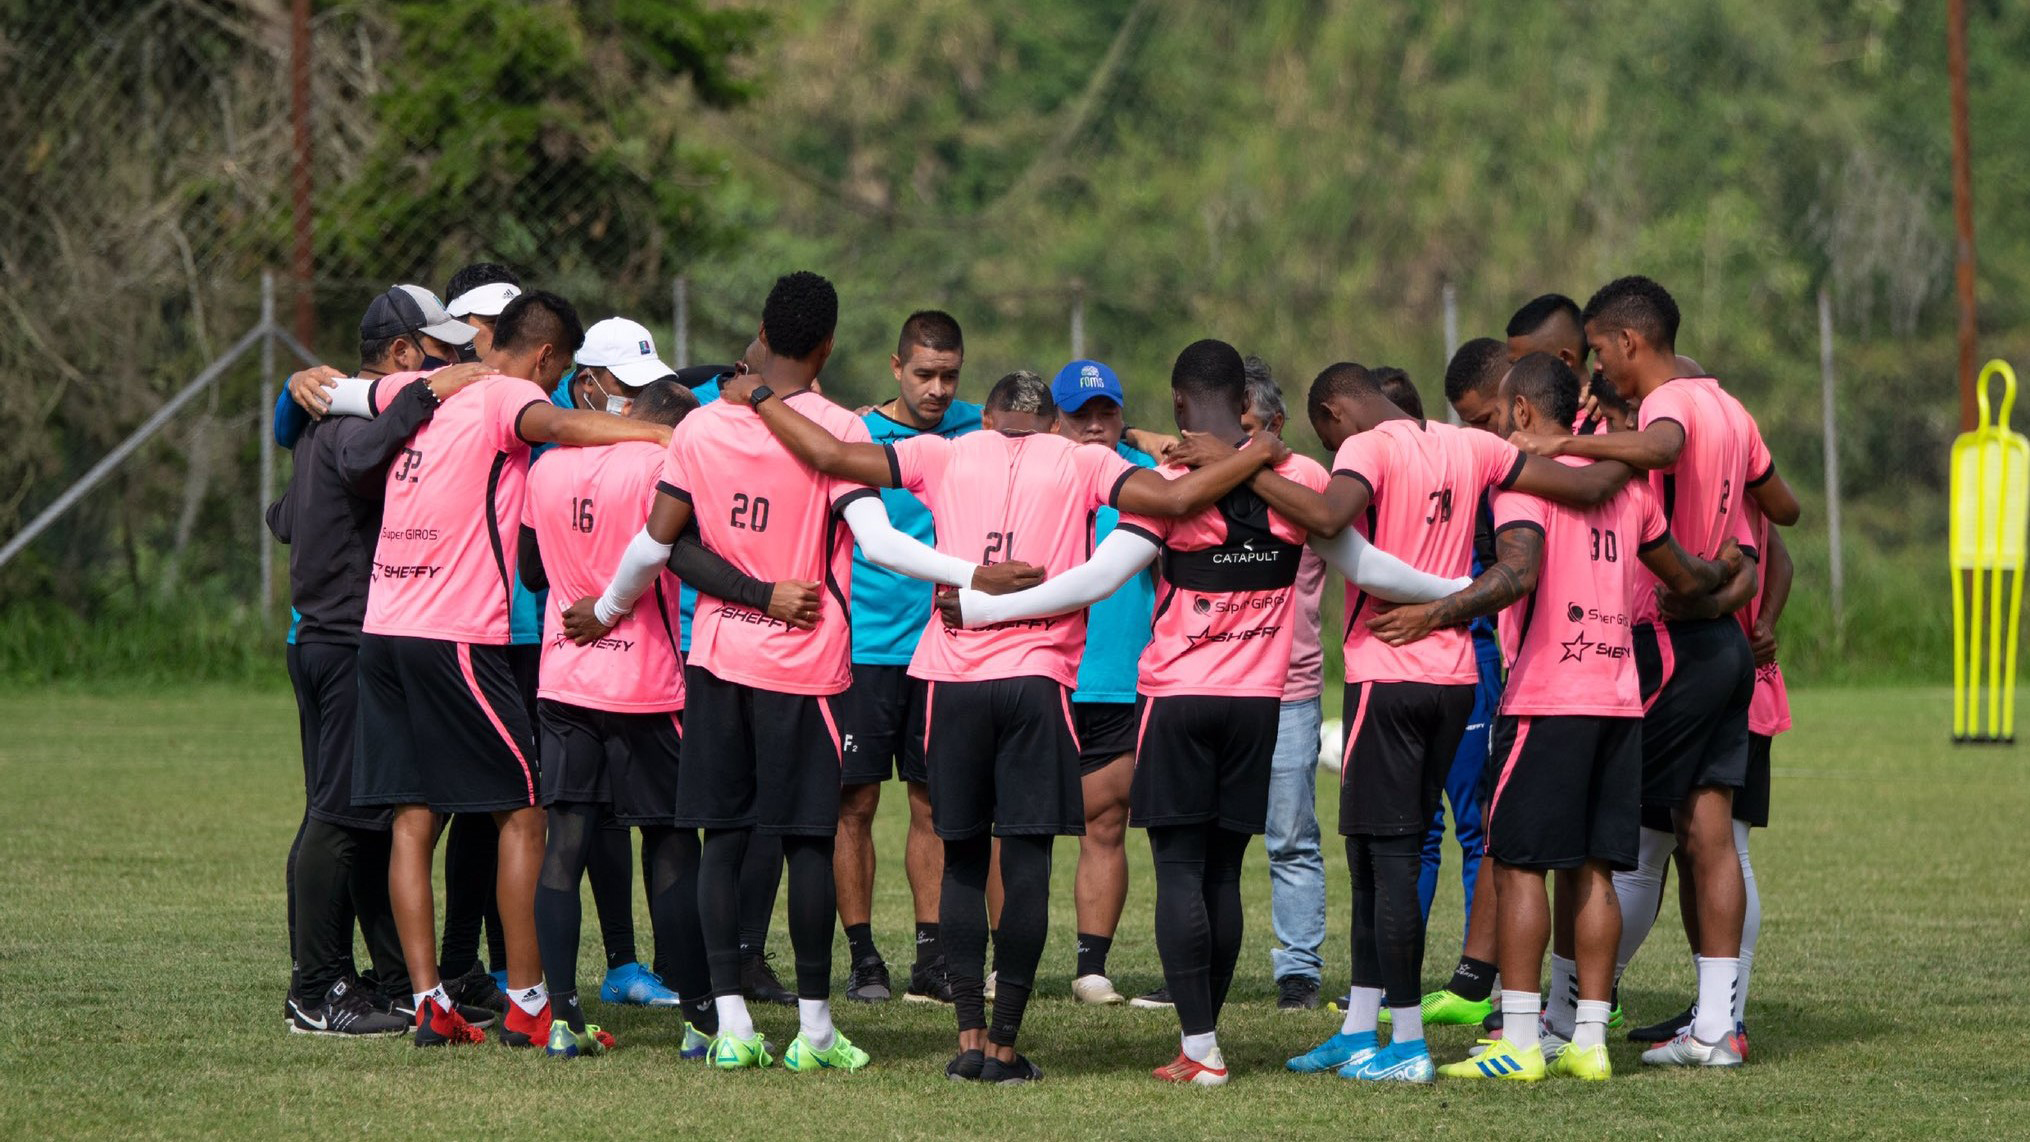 Corinthians Once Caldas Manizales Casa Blanca OC  (2)